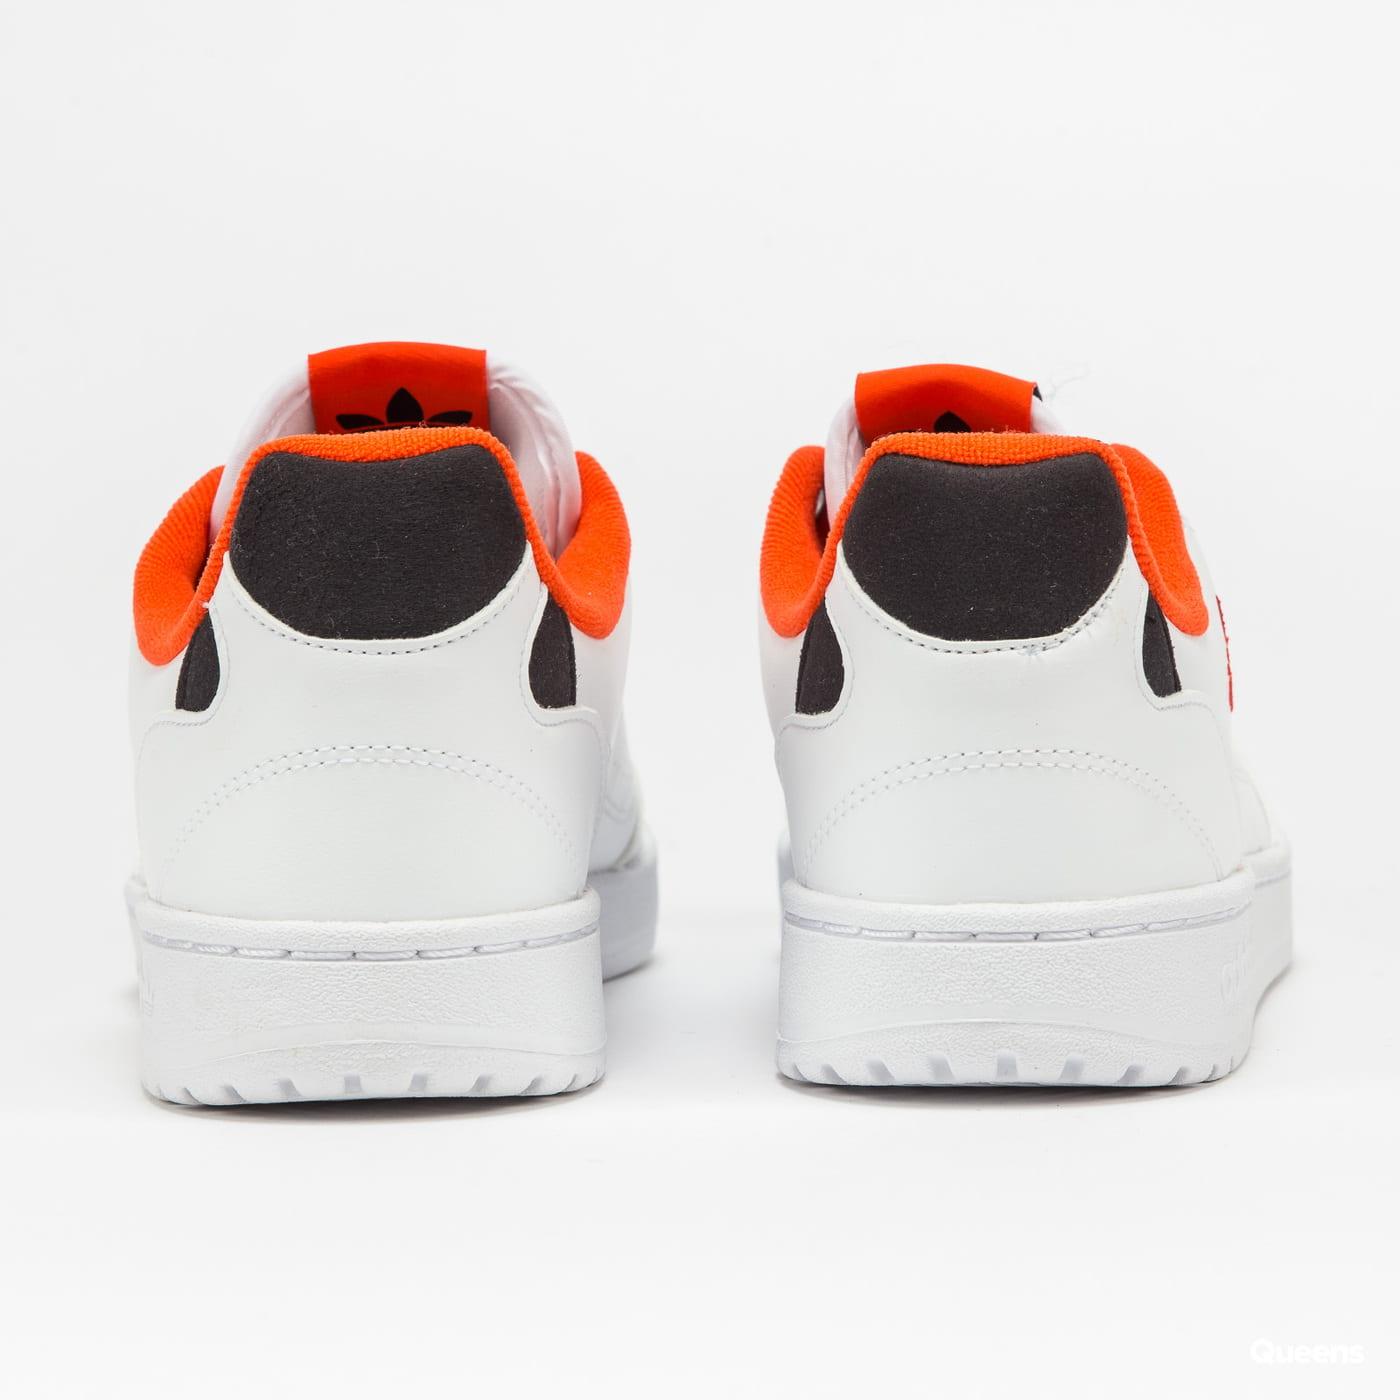 adidas Originals NY 90 ftwwht / sesore / cblack